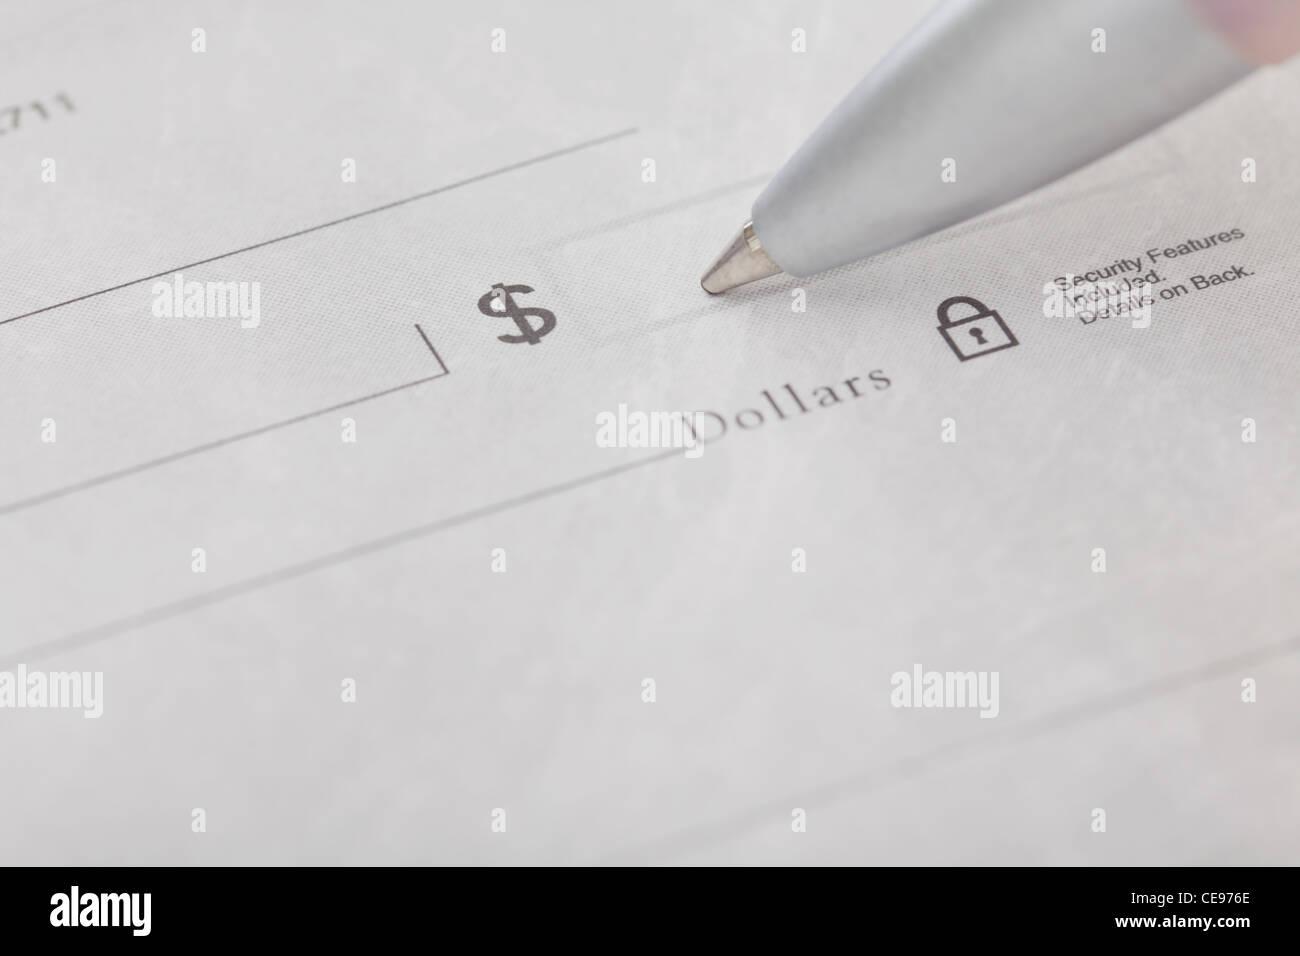 Studio shot of pen writing on receipt - Stock Image